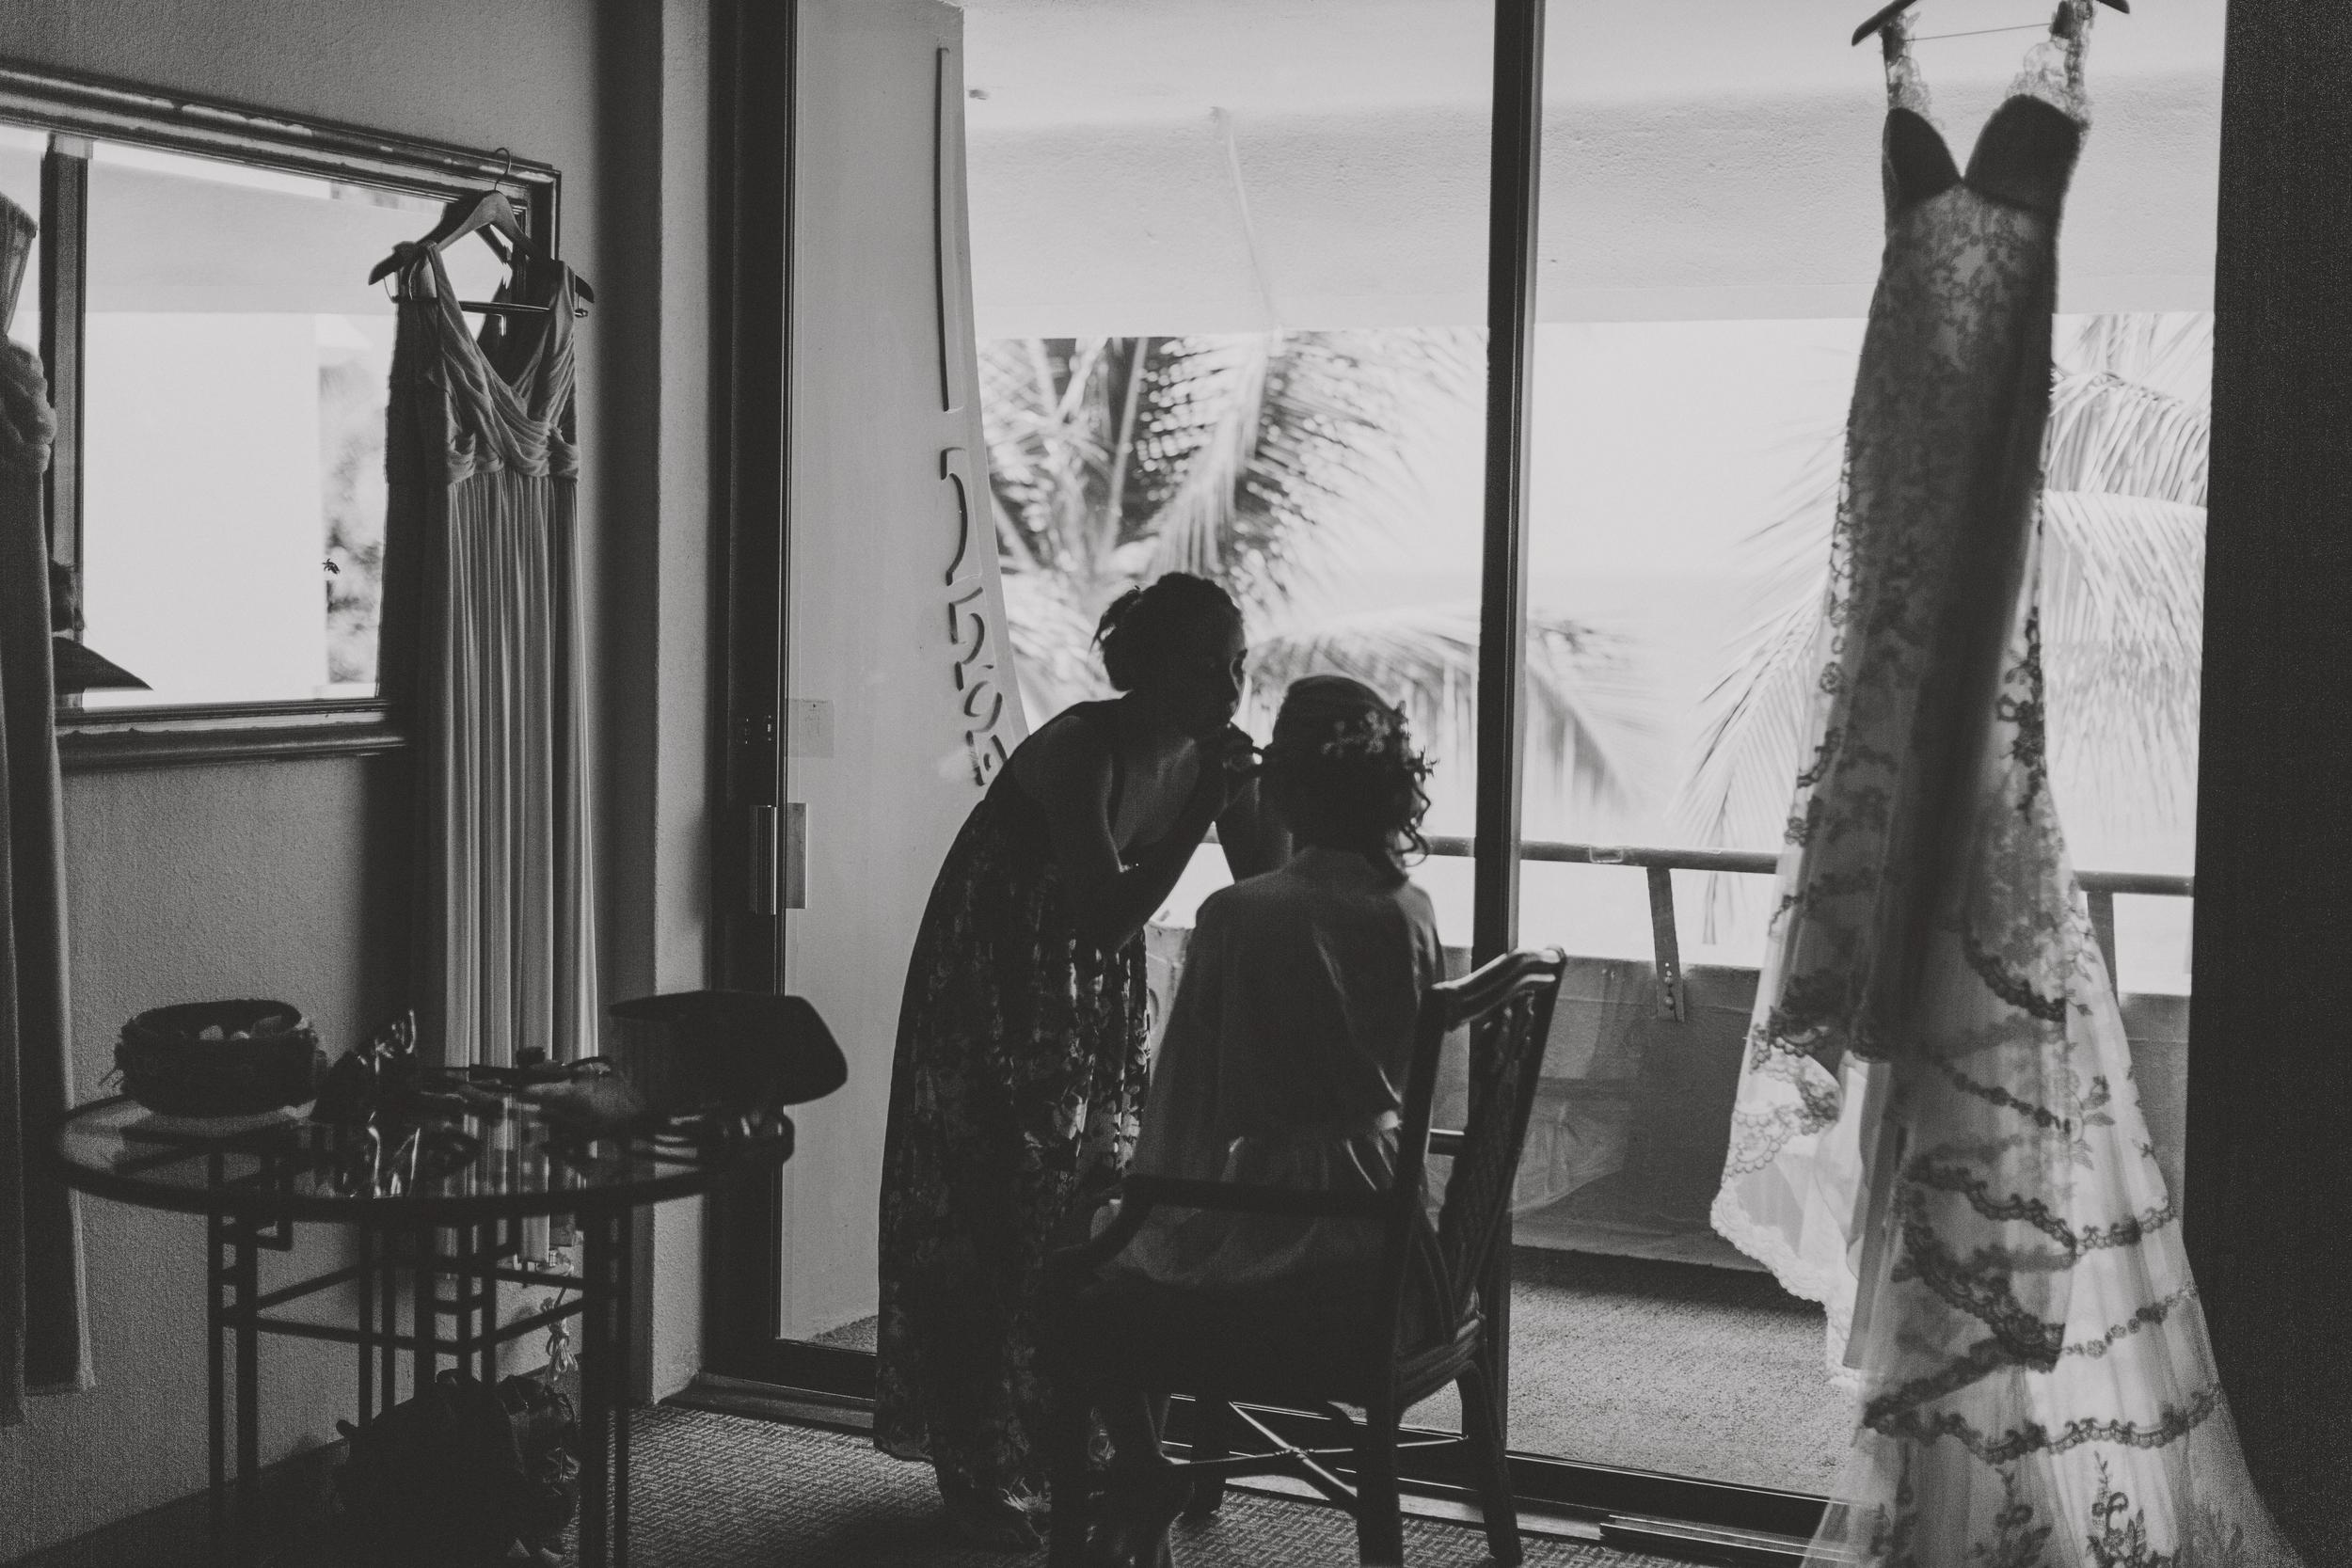 angie-diaz-photography-hawaii-wedding-photographer-kelli-jay-4.jpg